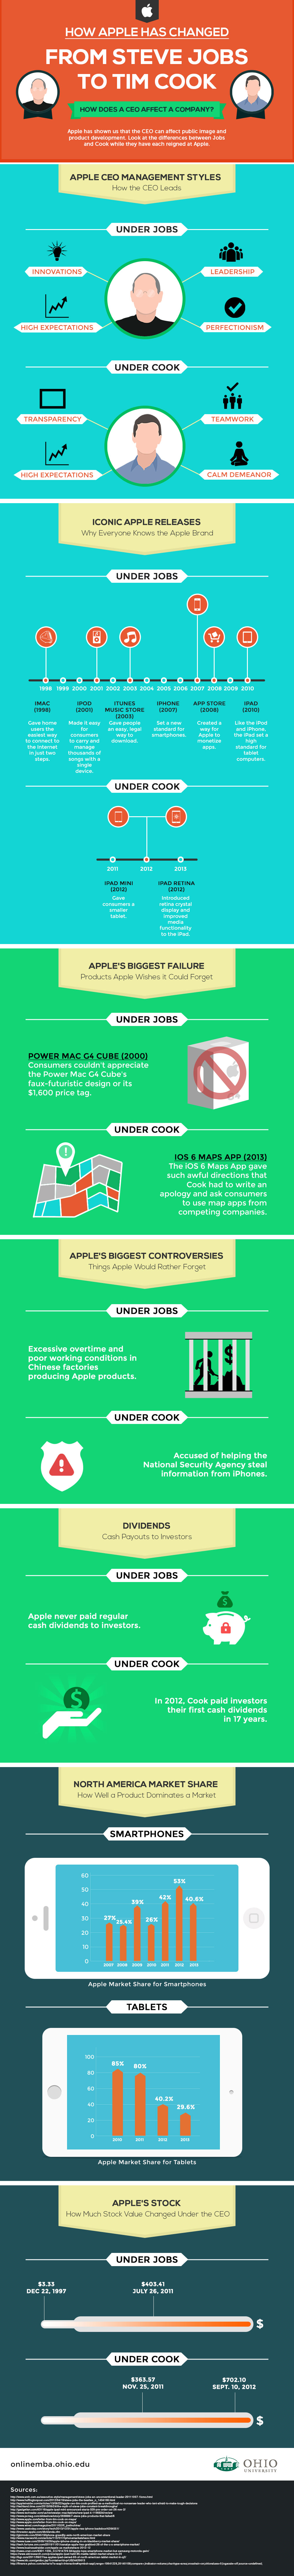 Steve Jobs vs Tim Cook - Infographic